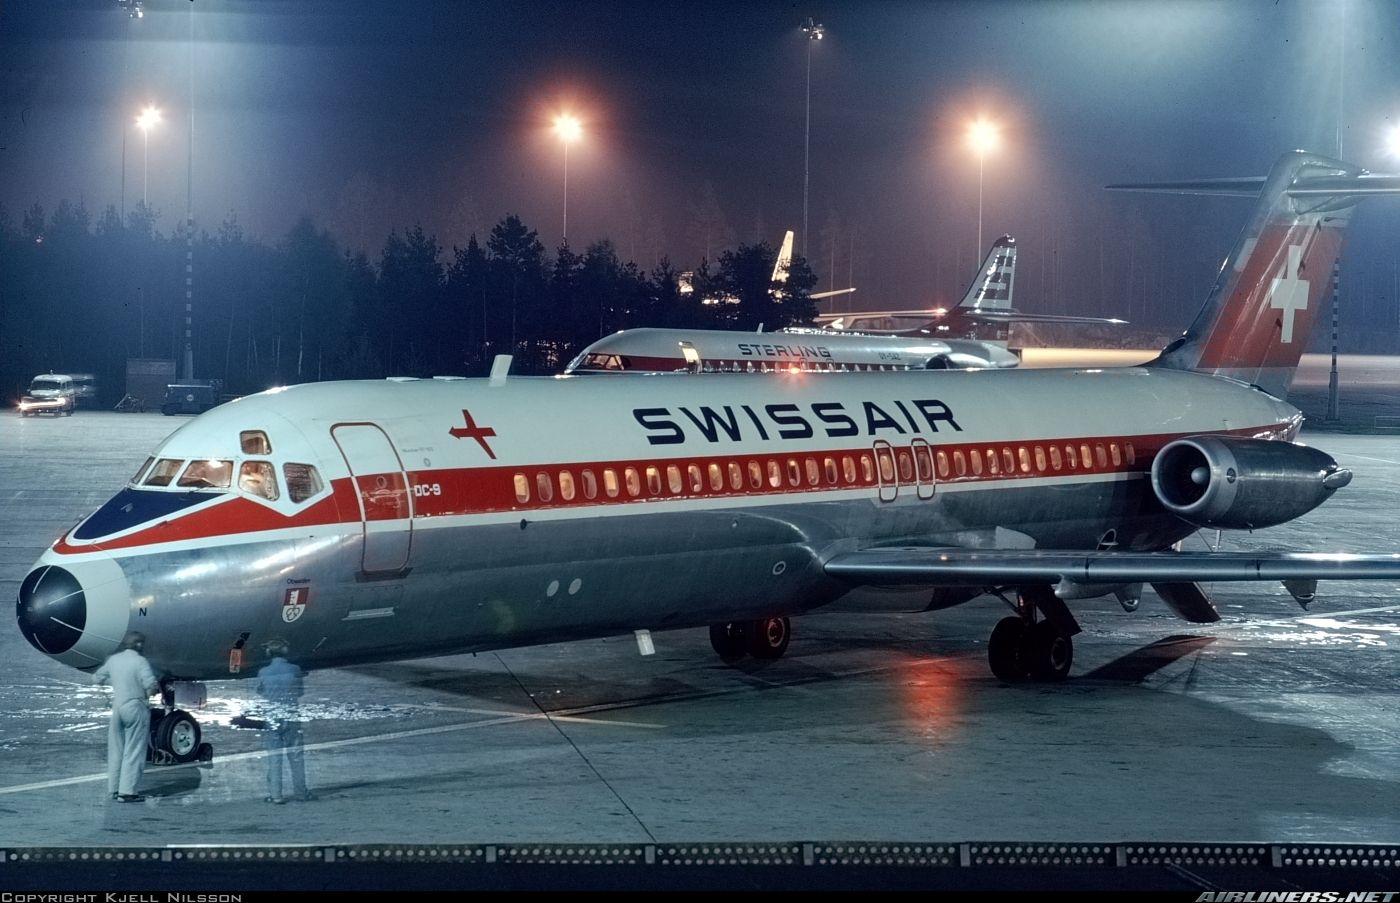 Photo Taken At Stockholm Arlanda Arn Essa In Sweden On August 20 1971 Aviation Vintage Airlines Airline Travel